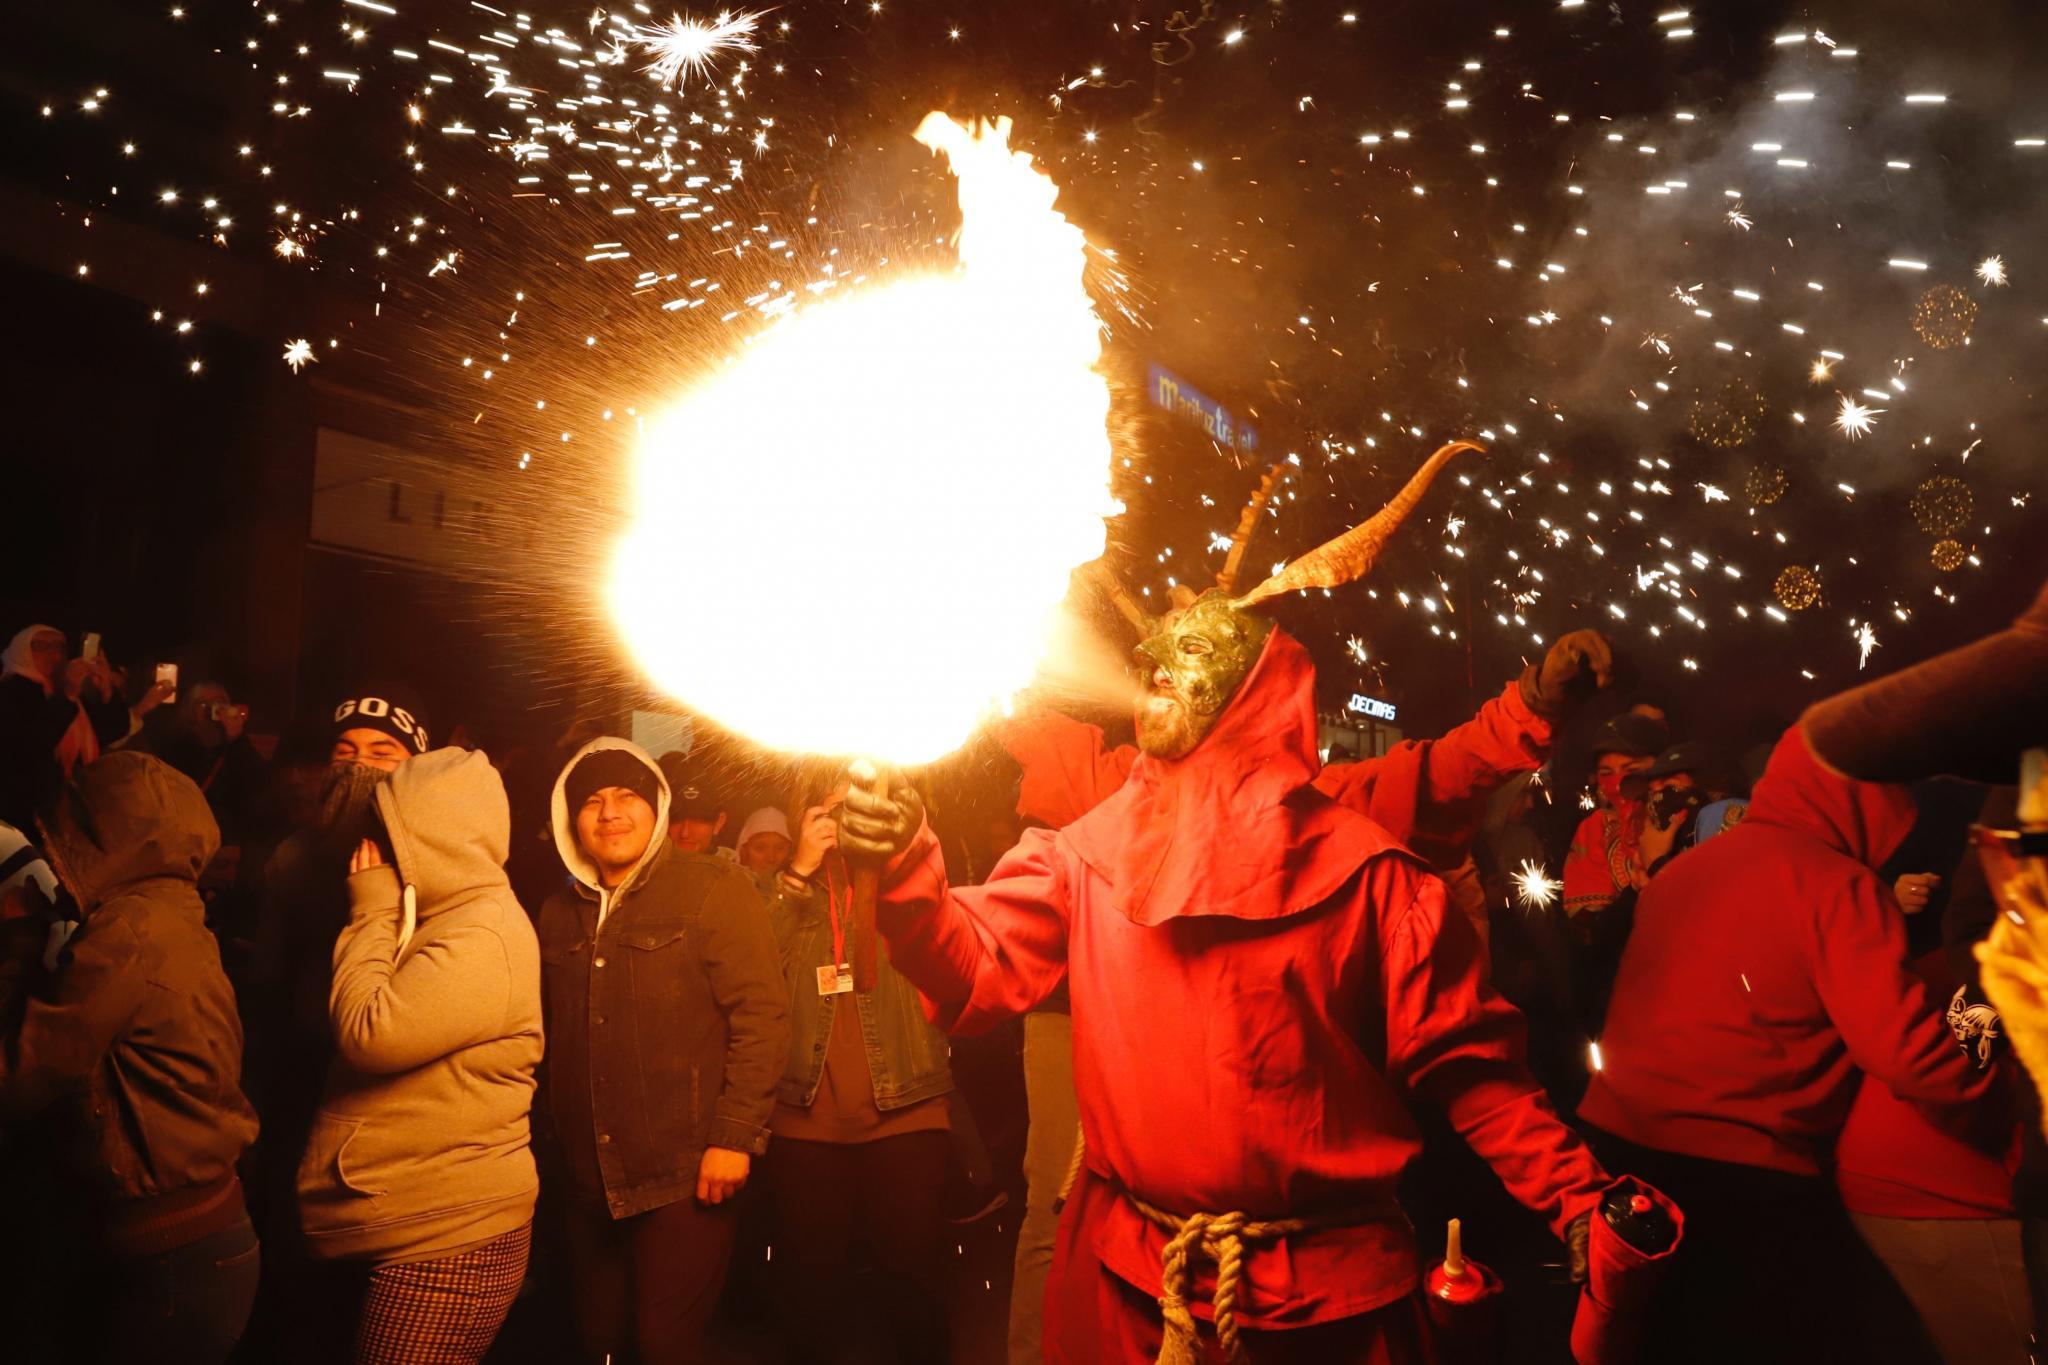 PALMA. FIESTAS POPULARES. Sant Sebastià 2020 clausura sus fiestas con un espectacular Correfoc ,